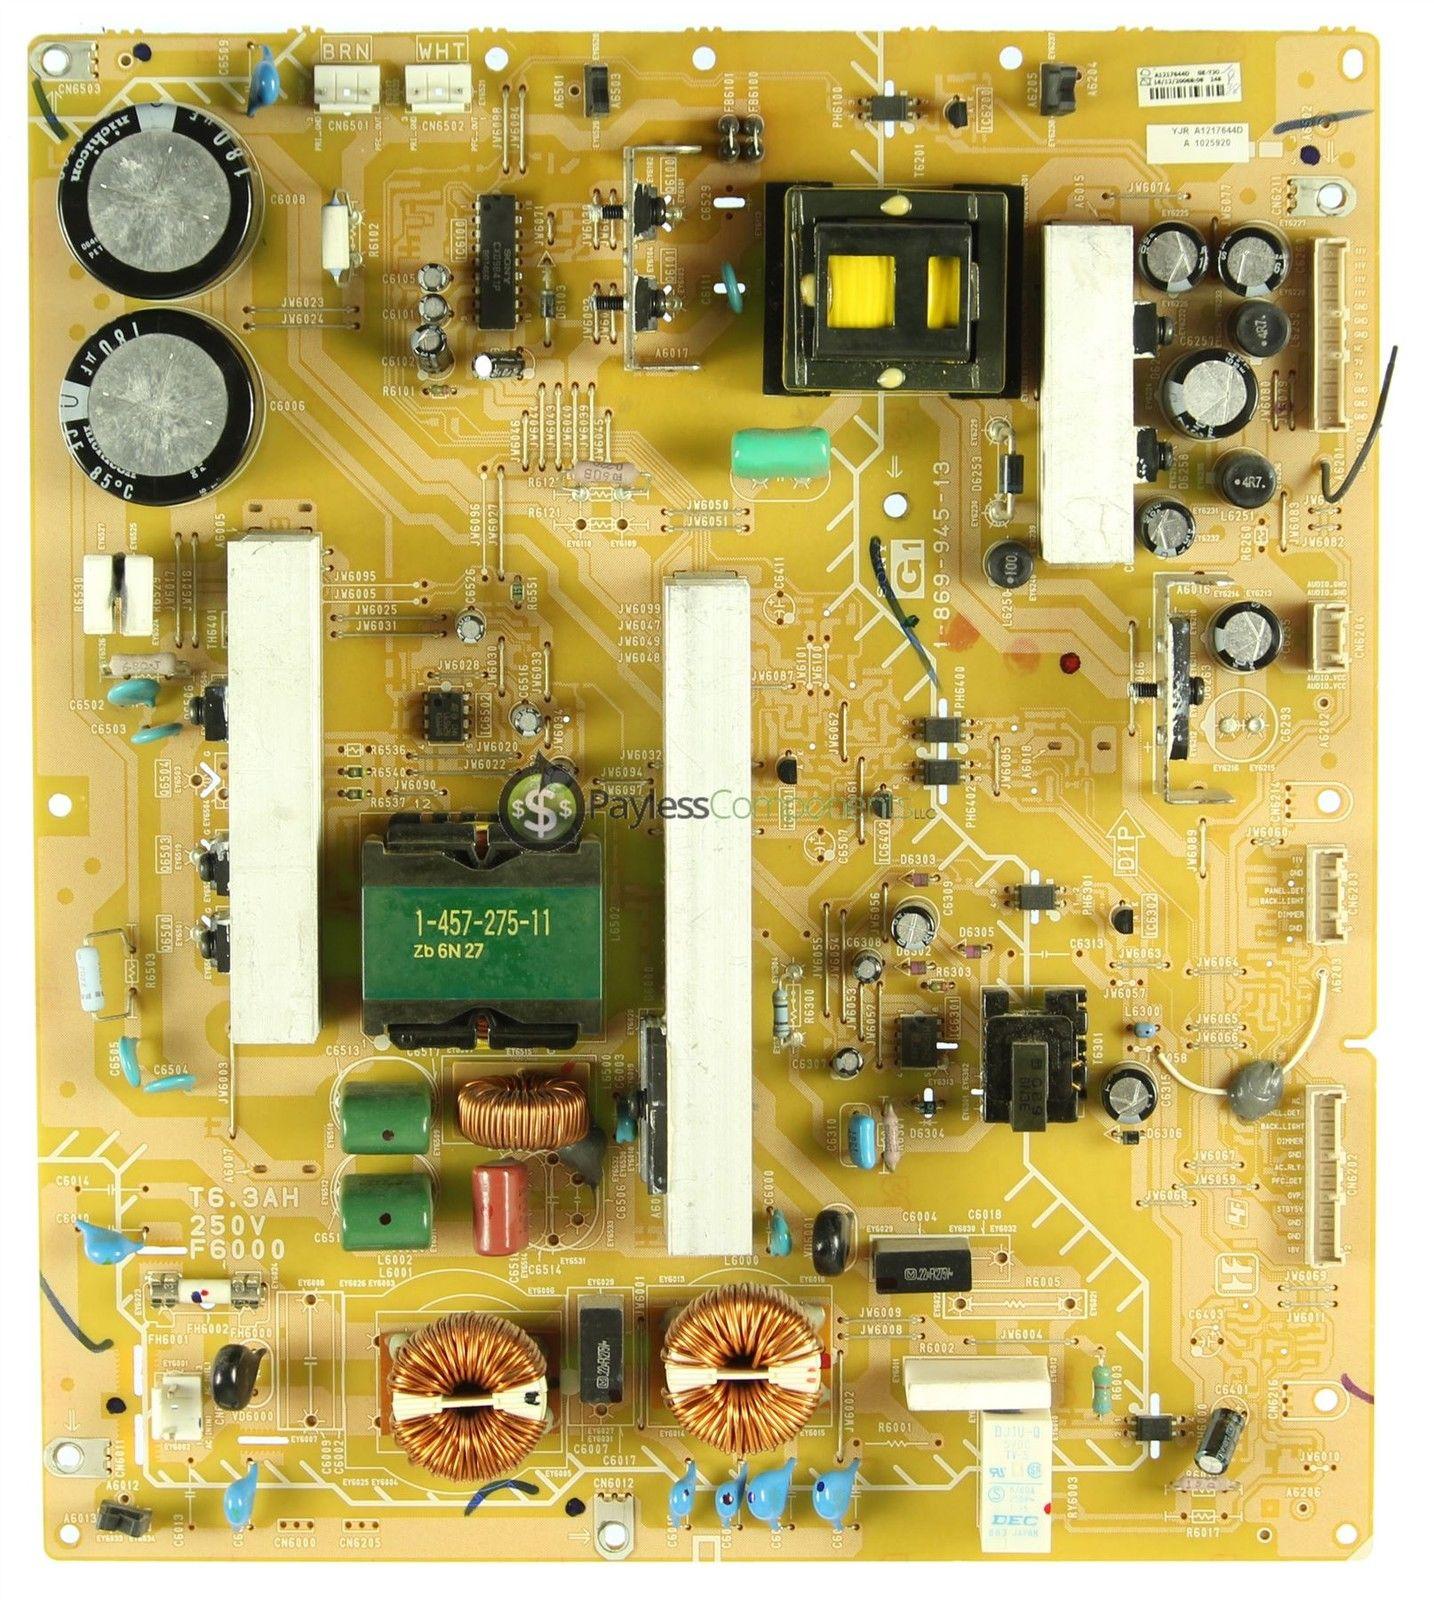 40 KDL-40XBR3 A-1217-644-D Power Supply Board Unit